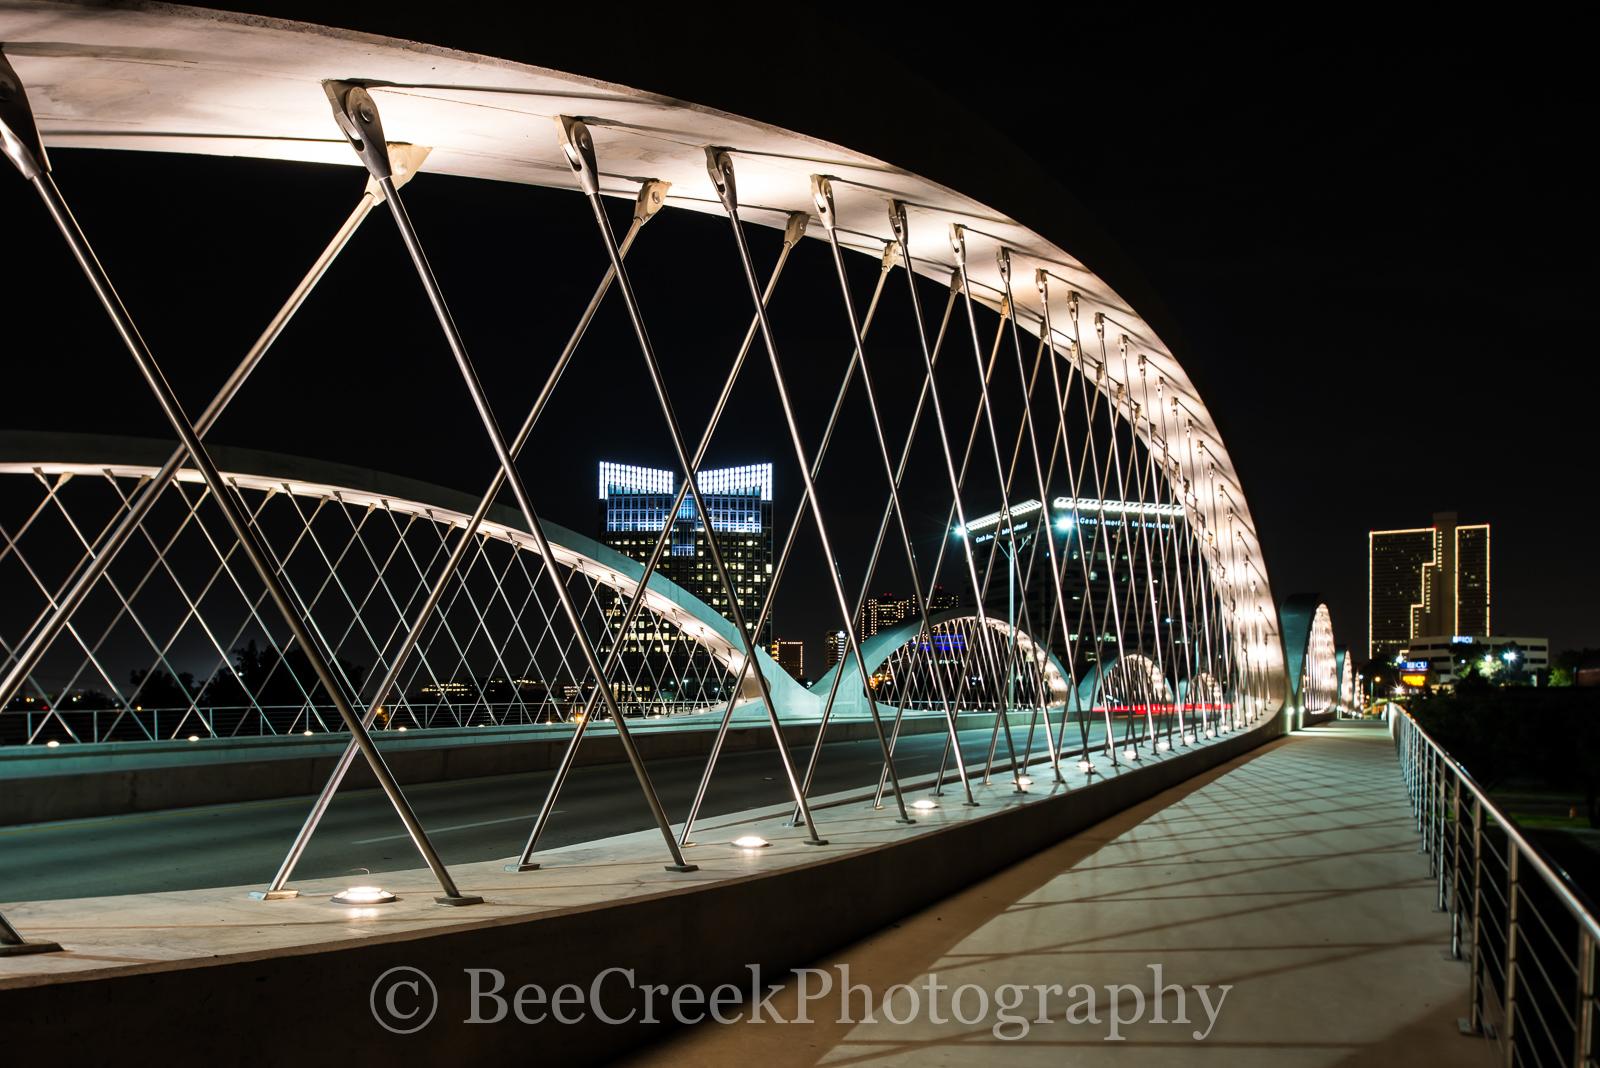 Fort Worth Bridge, Fort Worth Seventh Street Bridge, Fort Worth 7th Street Bridge,  cityscape, Fort Worth night skyline, photo